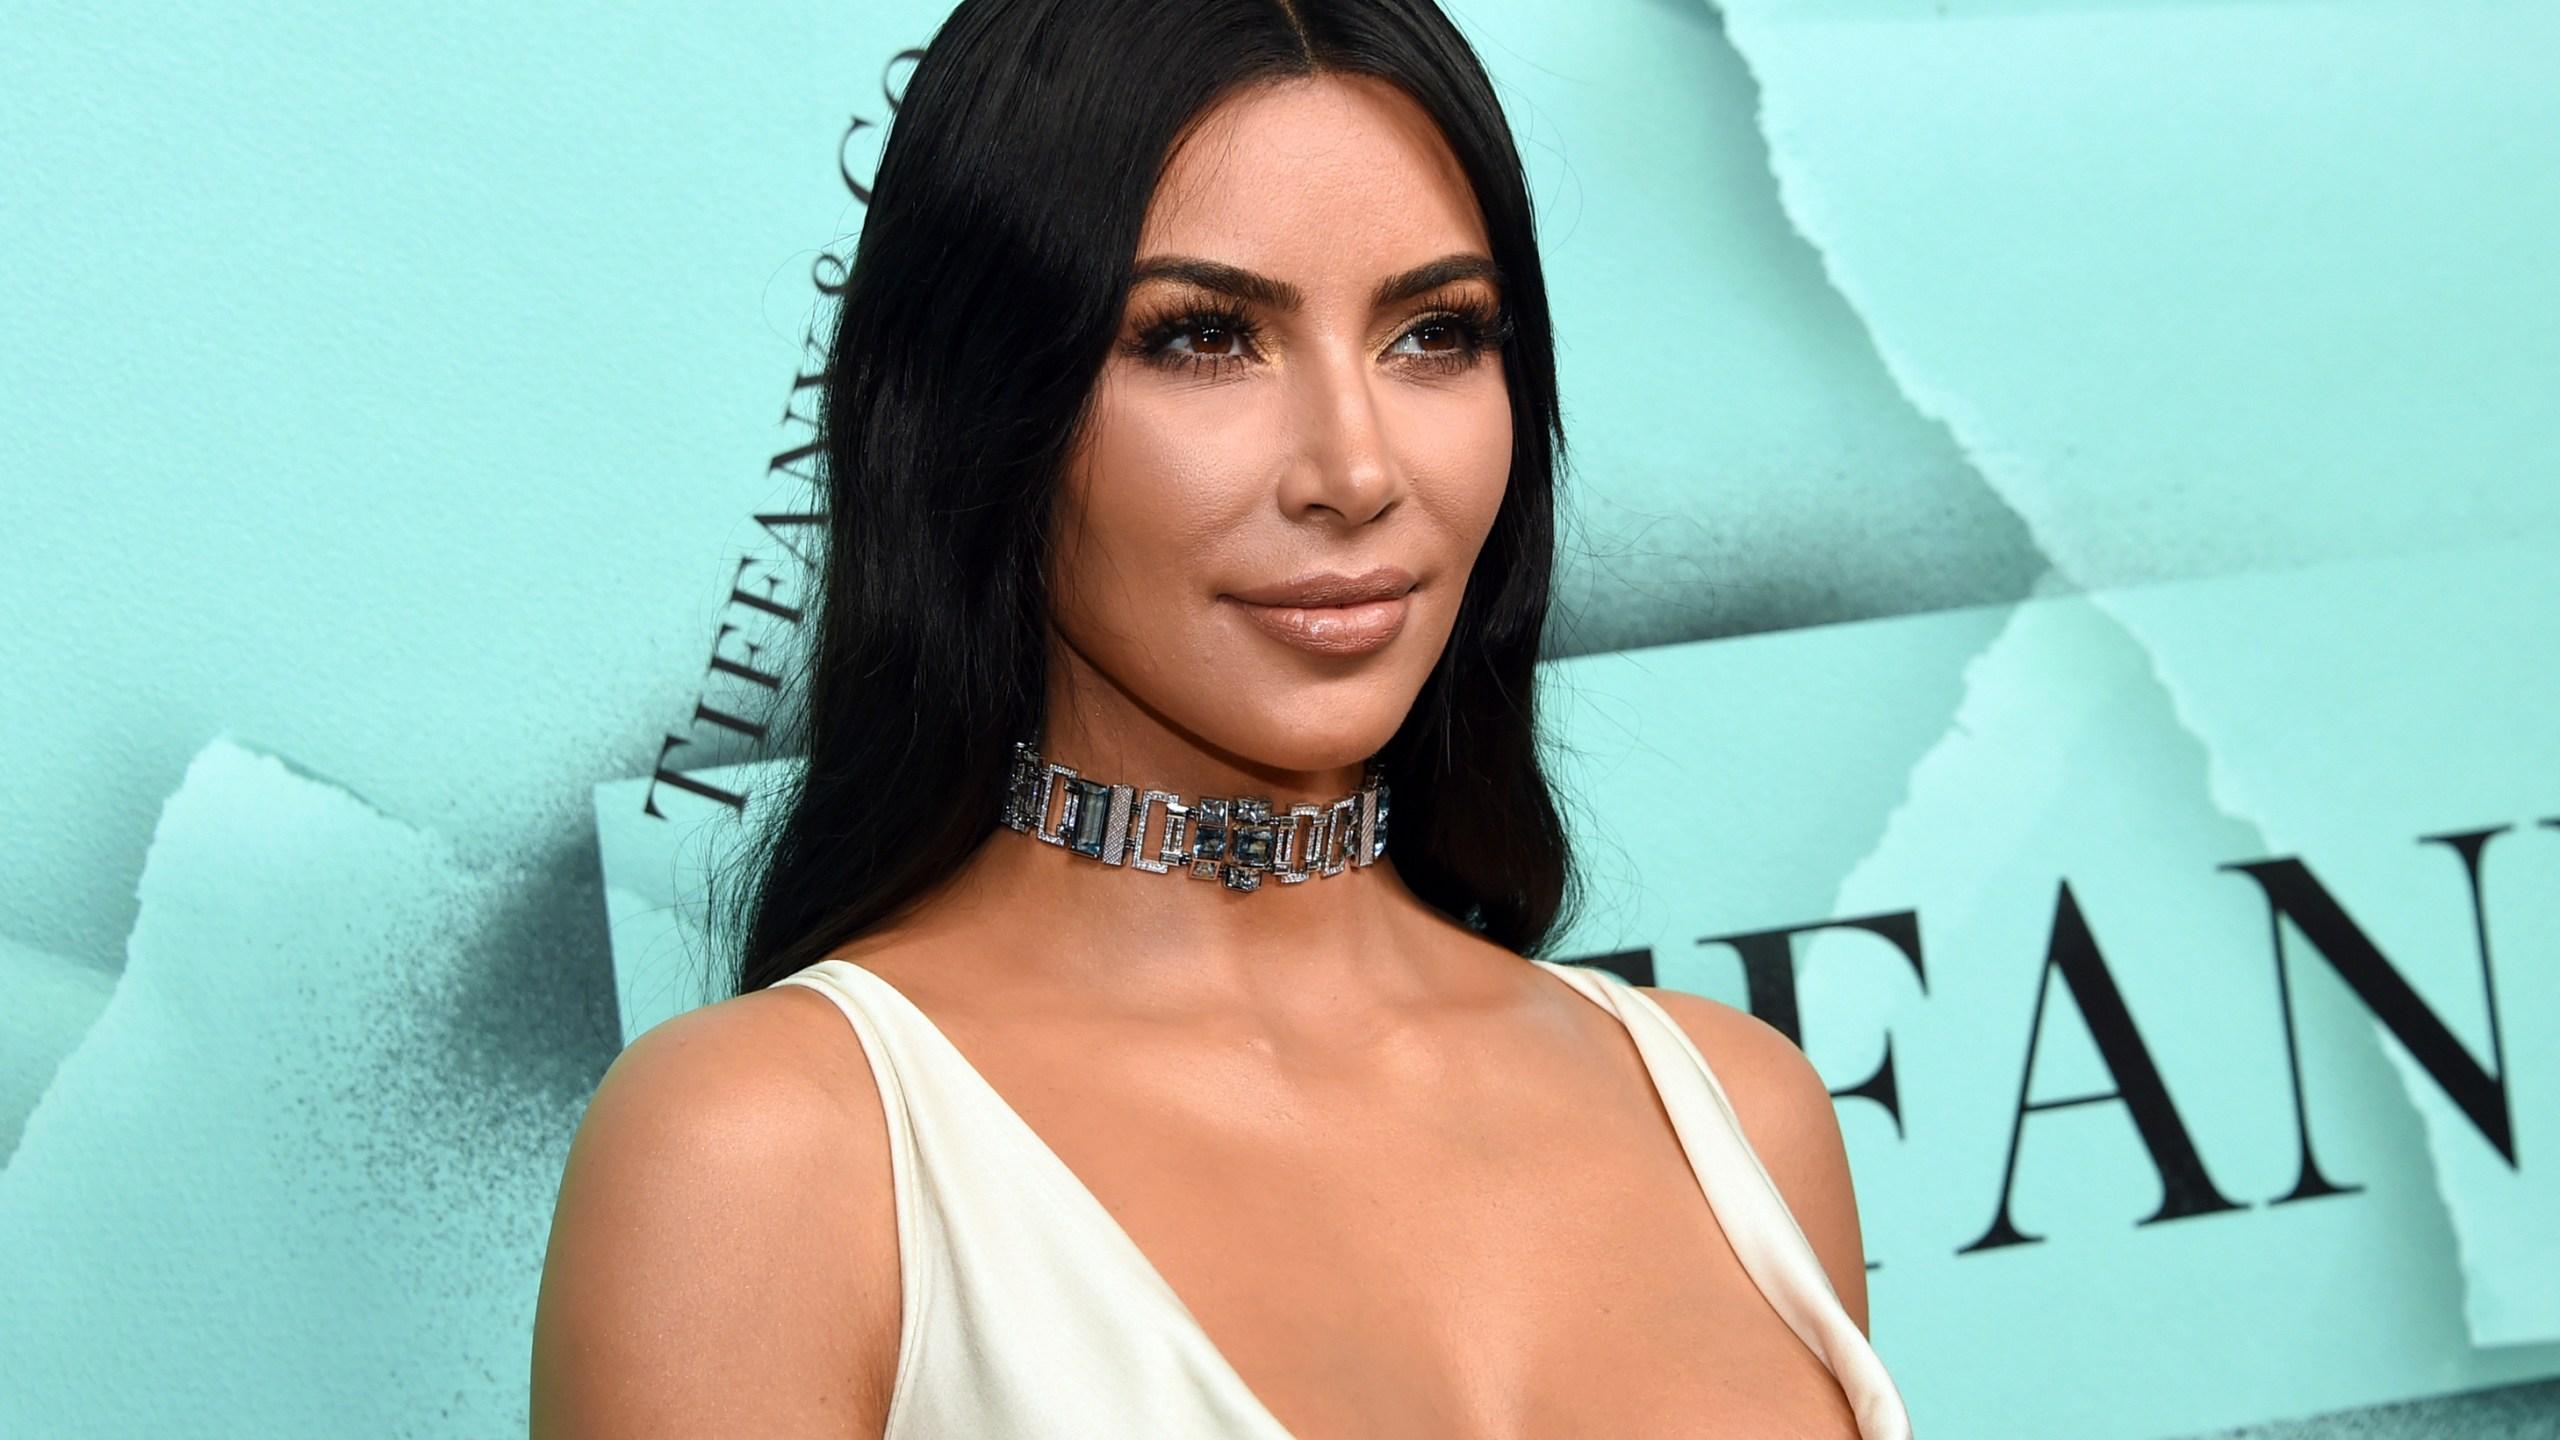 People-Kim_Kardashian_West_44134-159532.jpg04058408